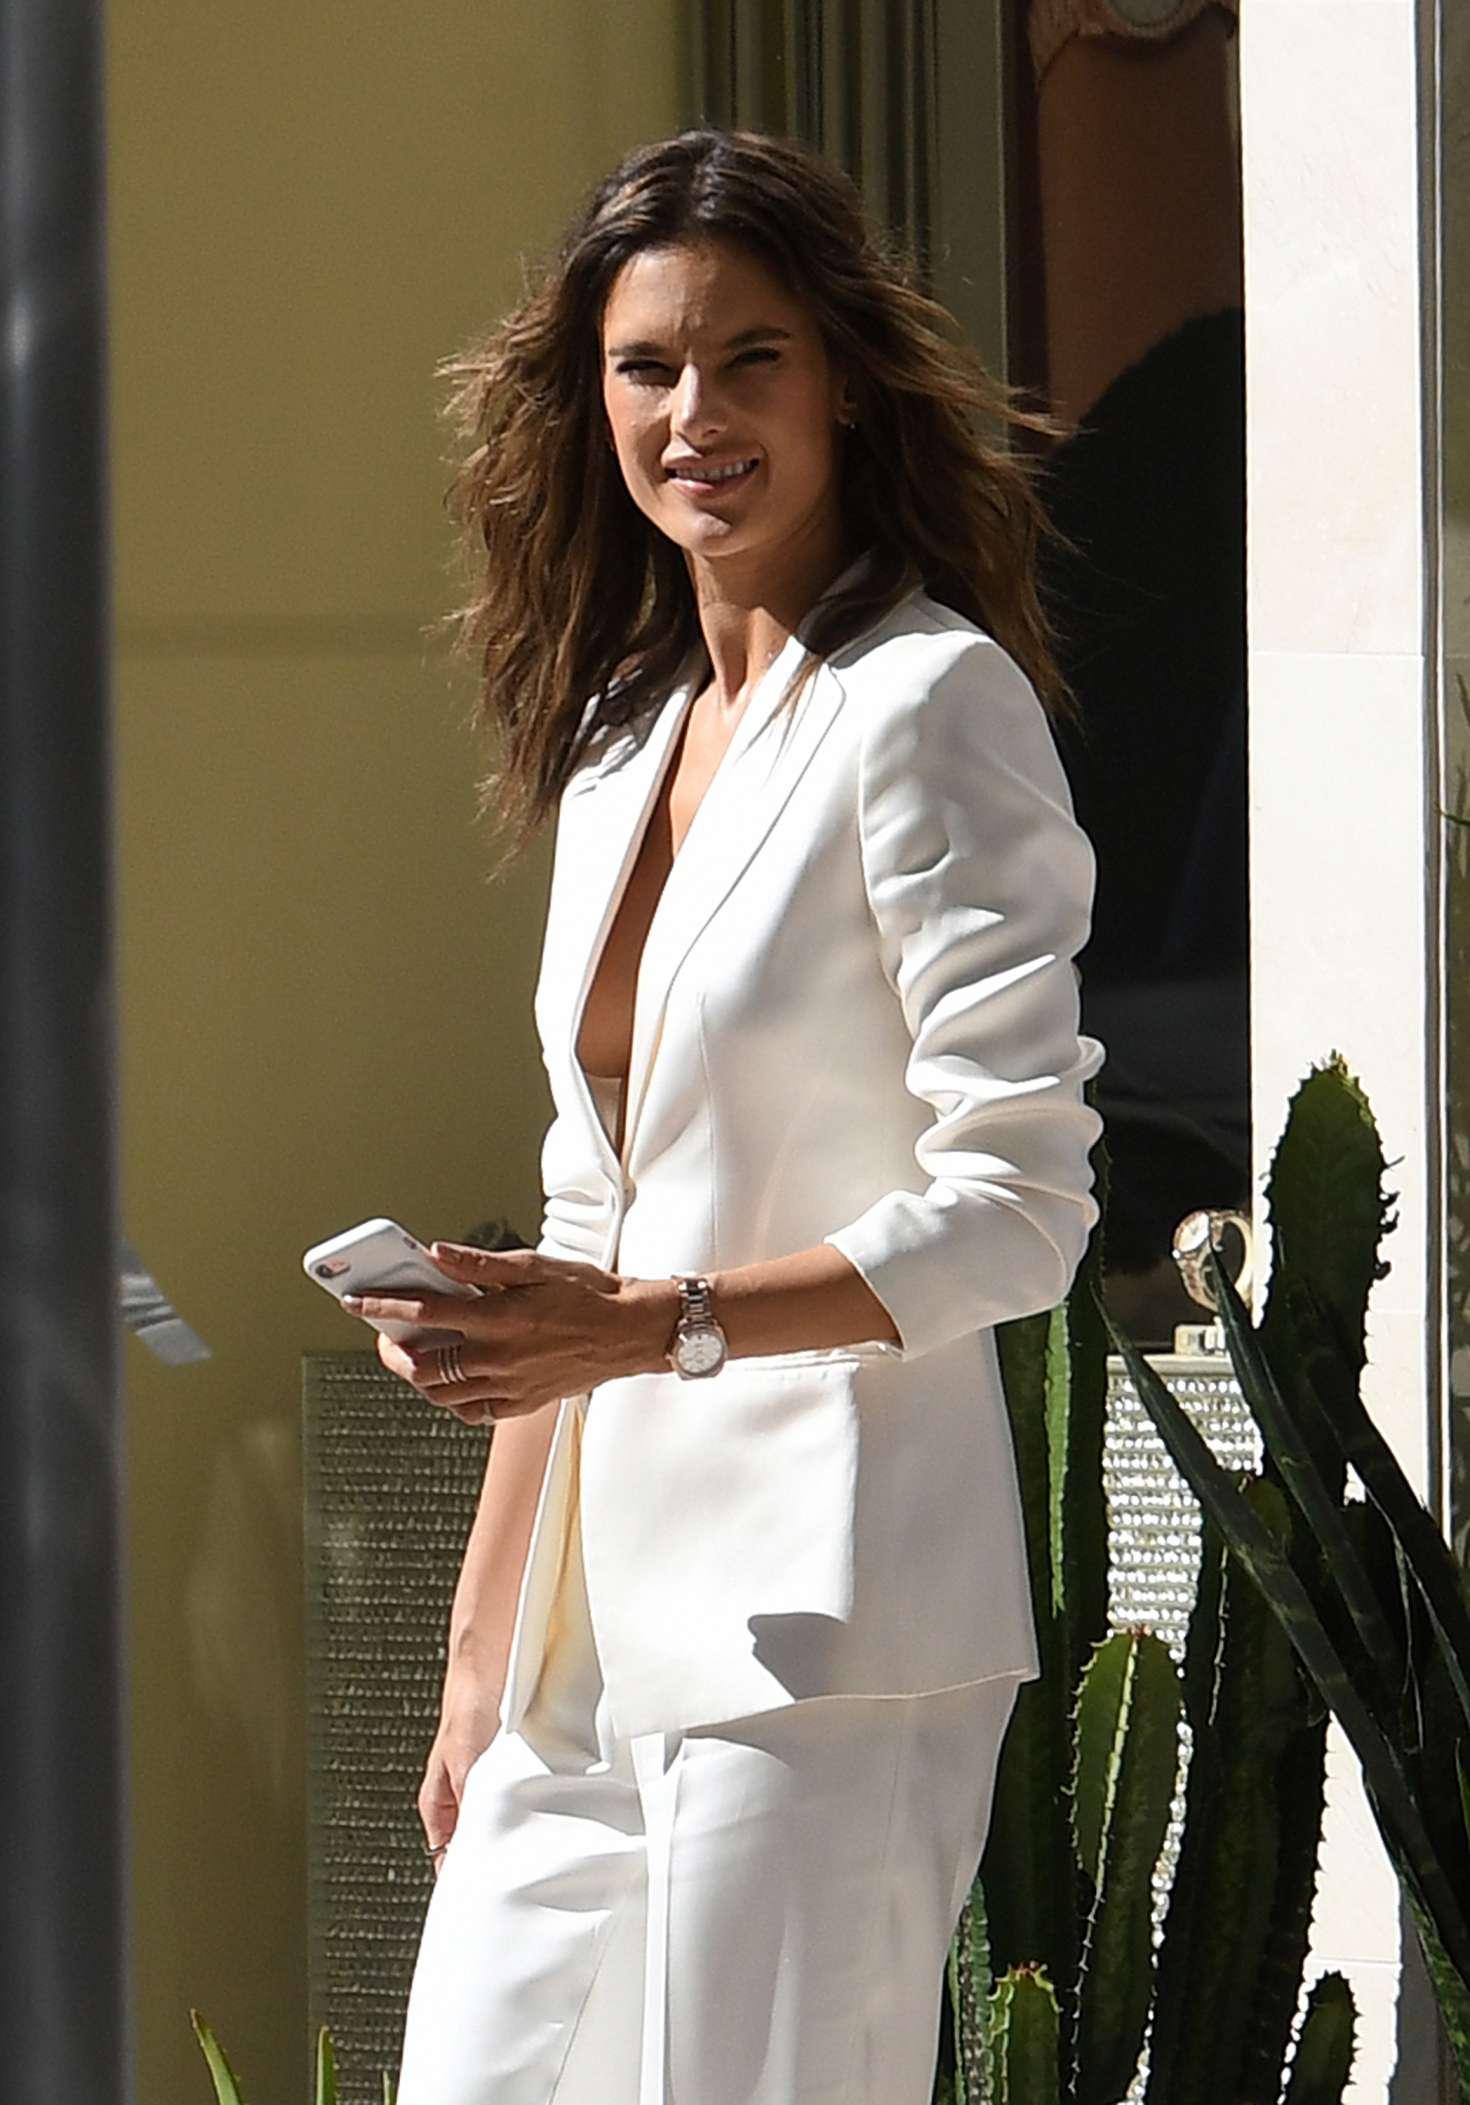 Alessandra Ambrosio in a white pantsuit in Miami